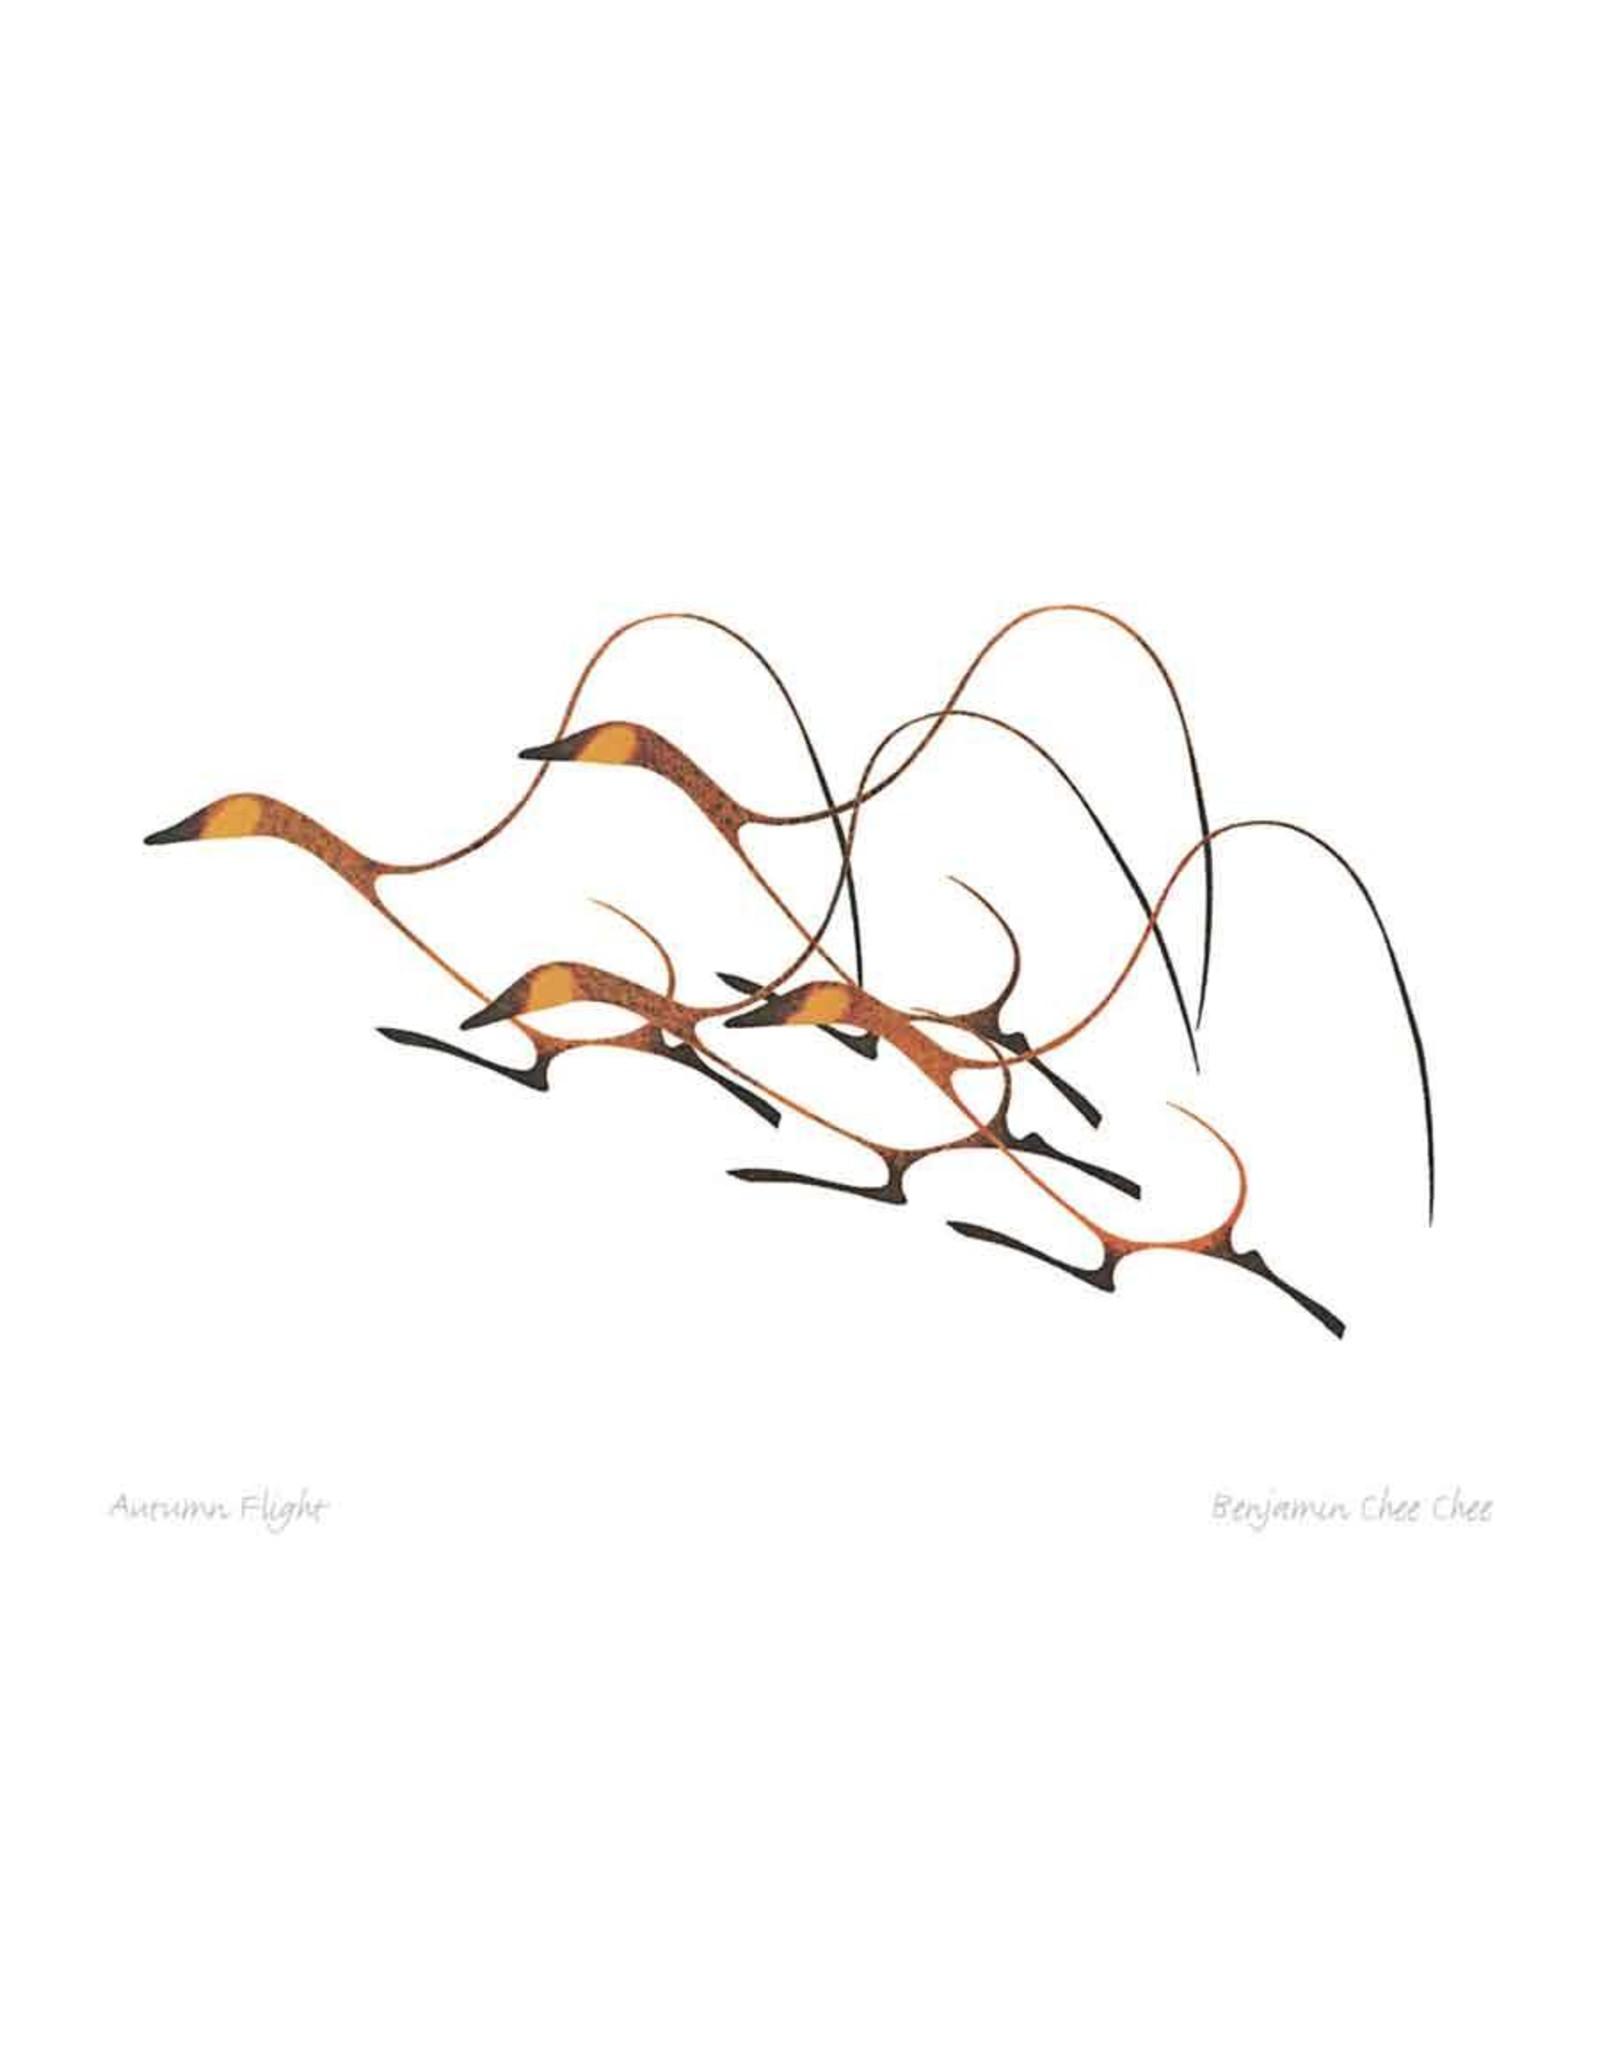 Autumn Flight par Benjamin Chee Chee Carte